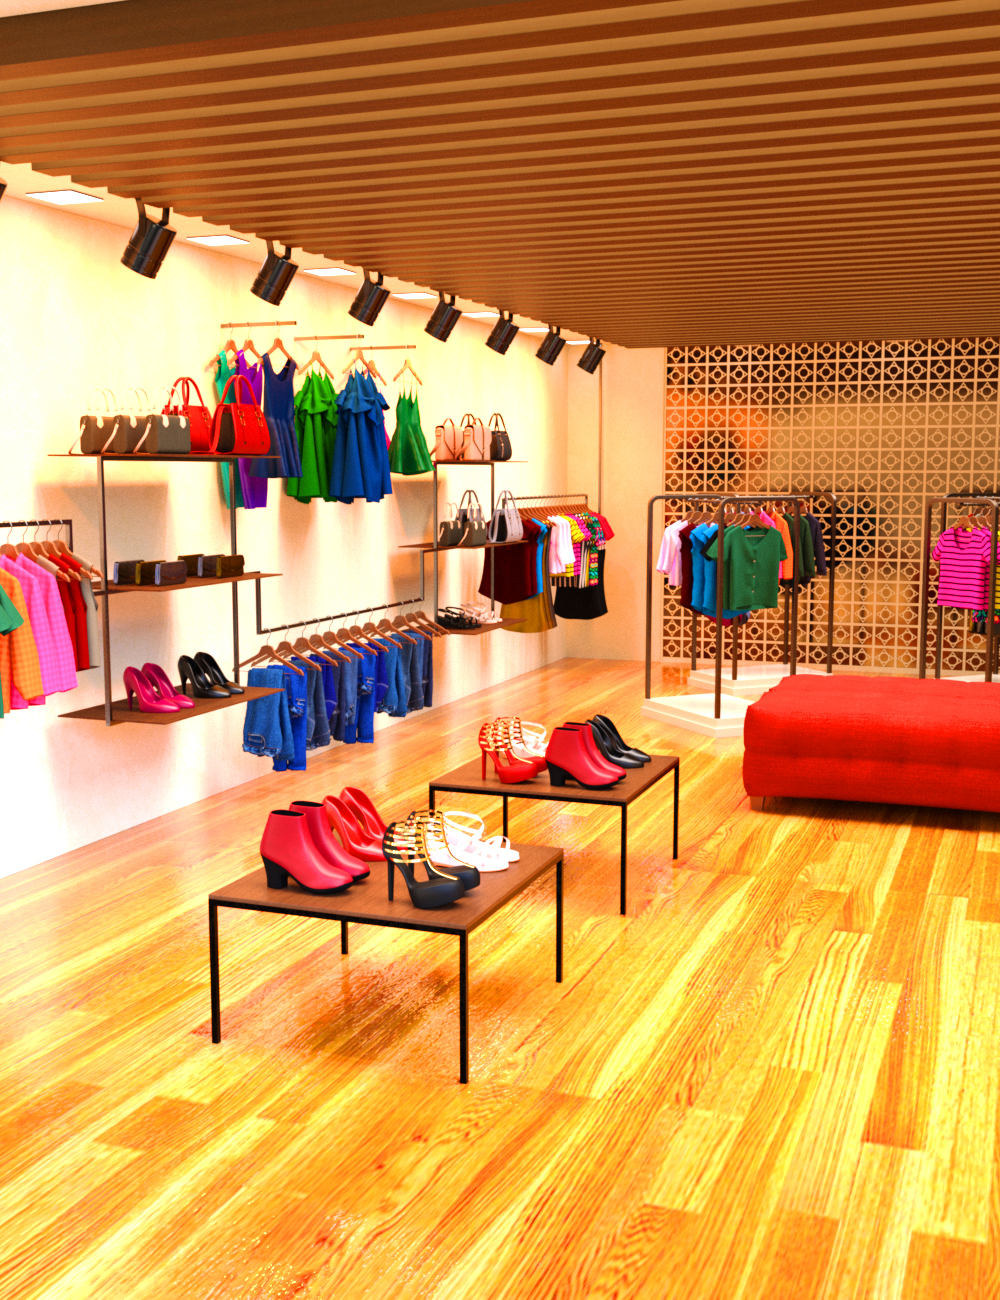 Clothes Shop by: Charlie, 3D Models by Daz 3D